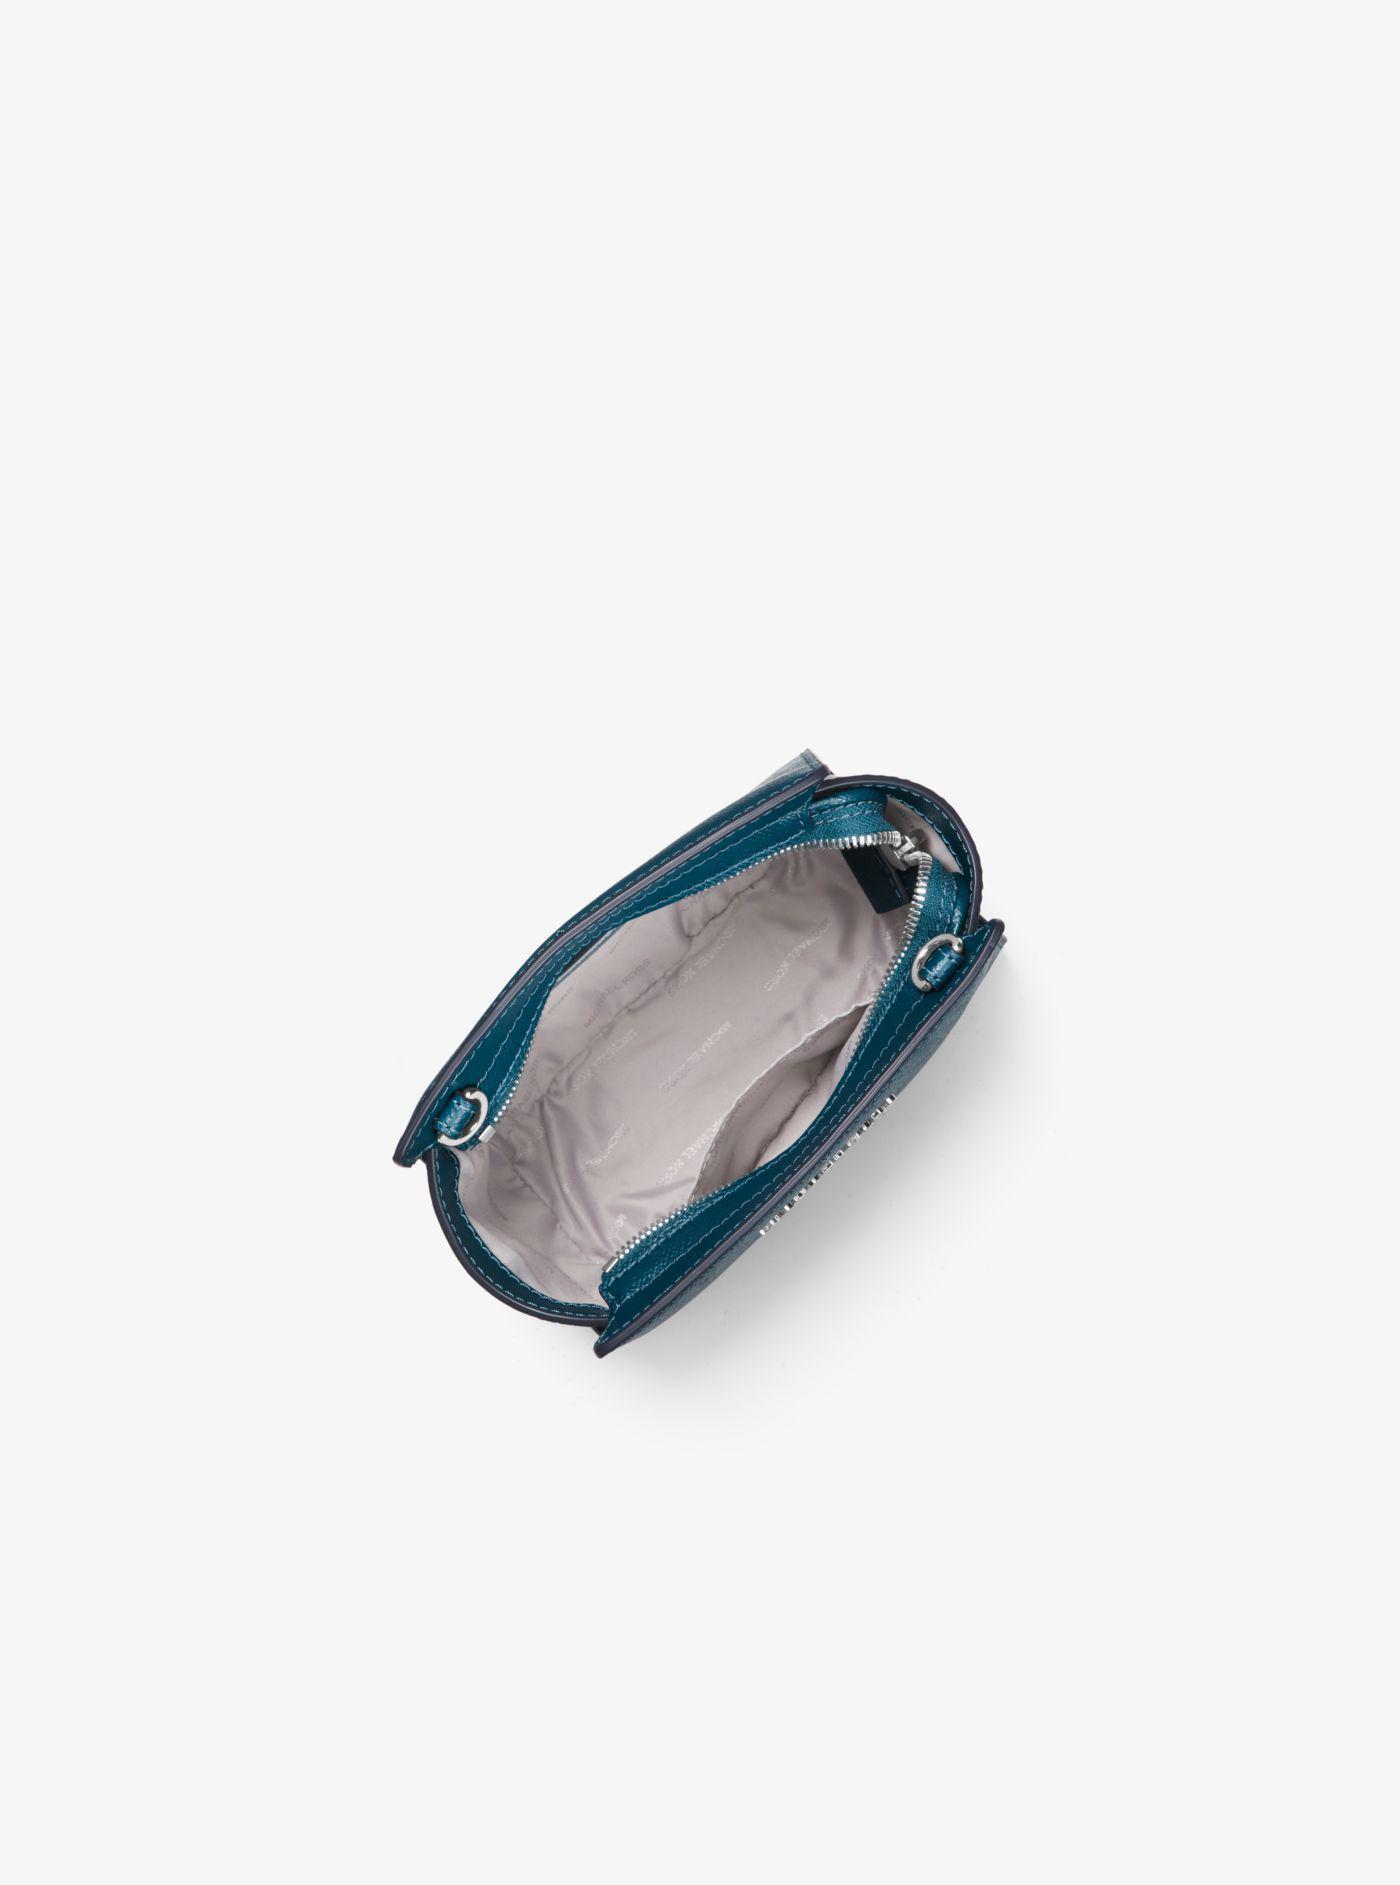 Lyst - Michael Kors Selma Mini Crossgrain Leather Crossbody in Blue e3916c5ee733e